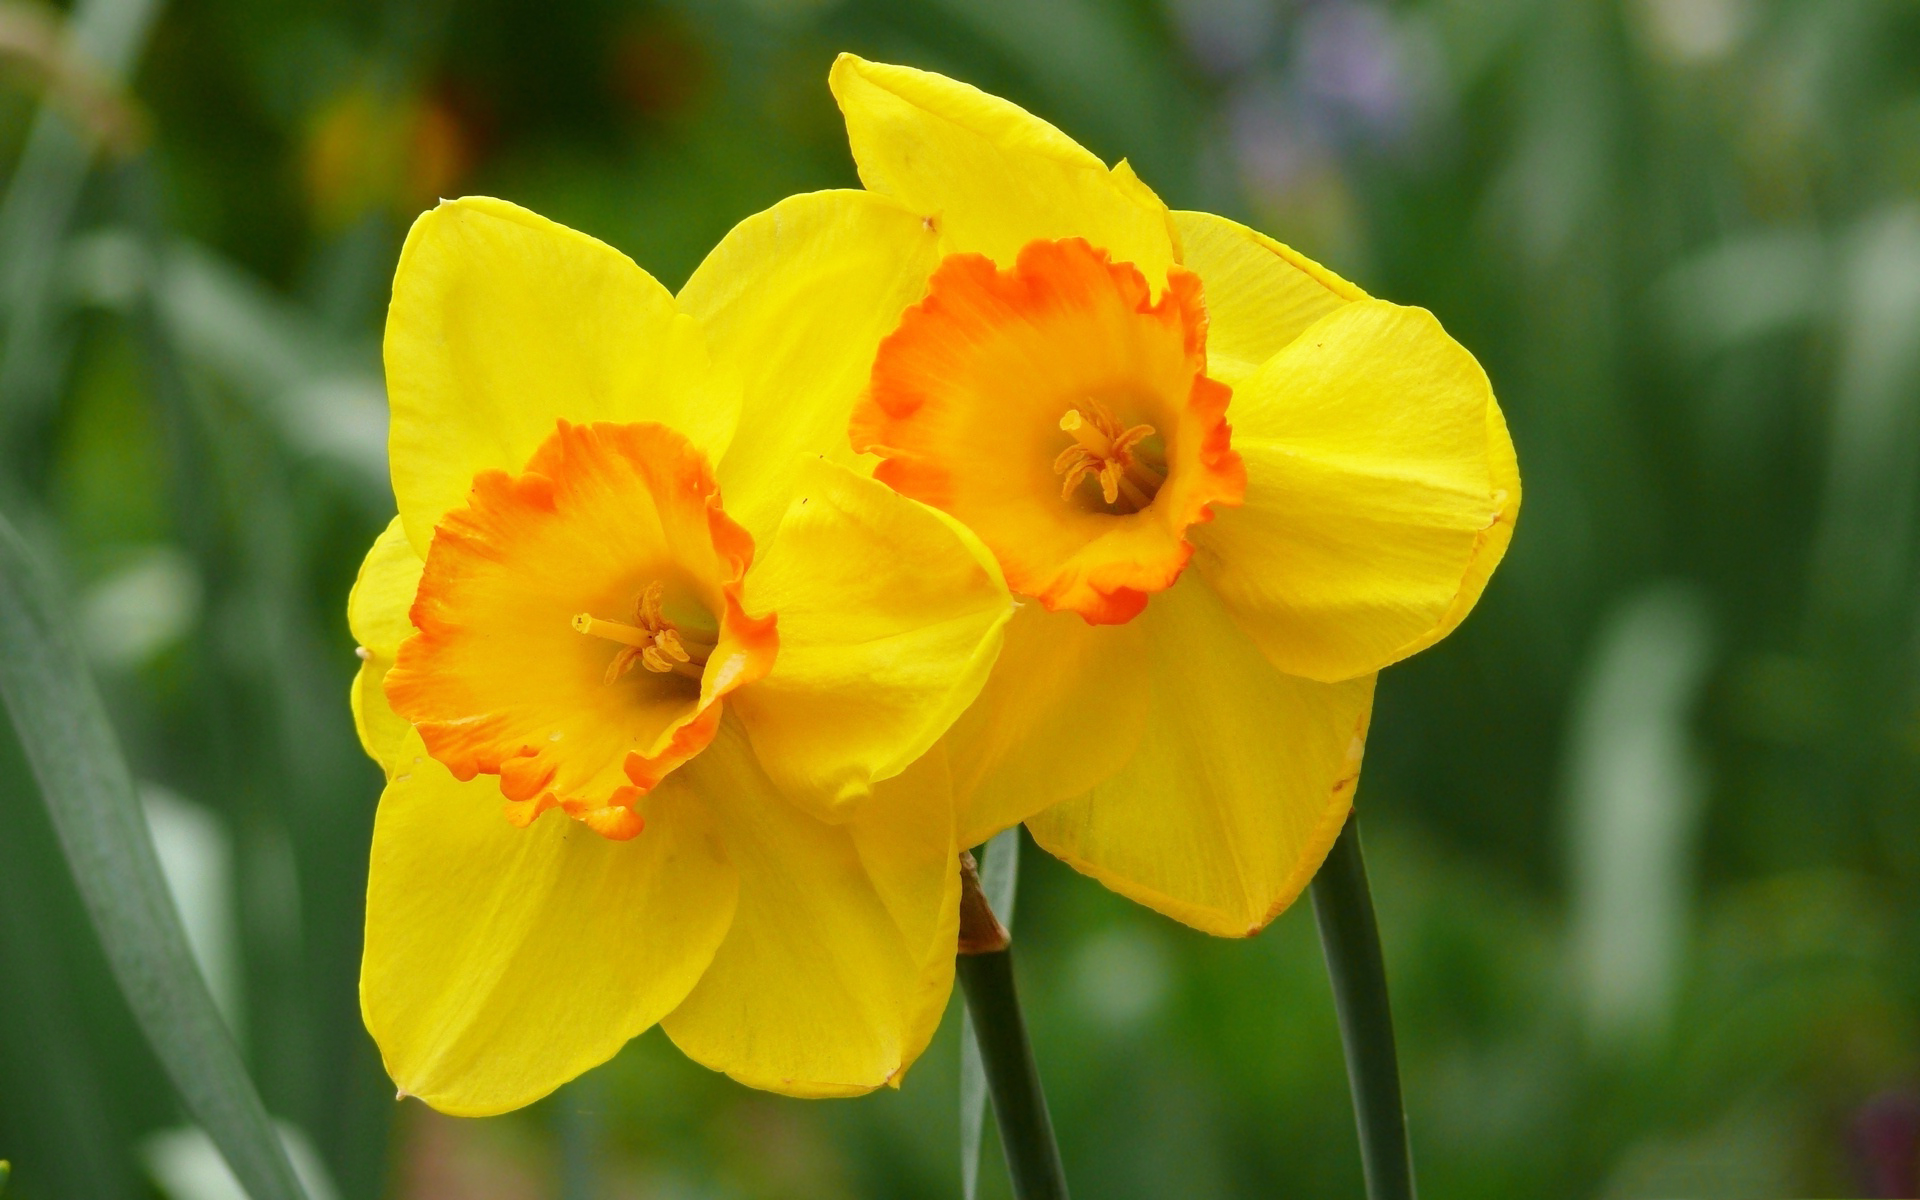 Batman 3d Live Wallpaper Yellow Daffodils Hd Hd Desktop Wallpapers 4k Hd